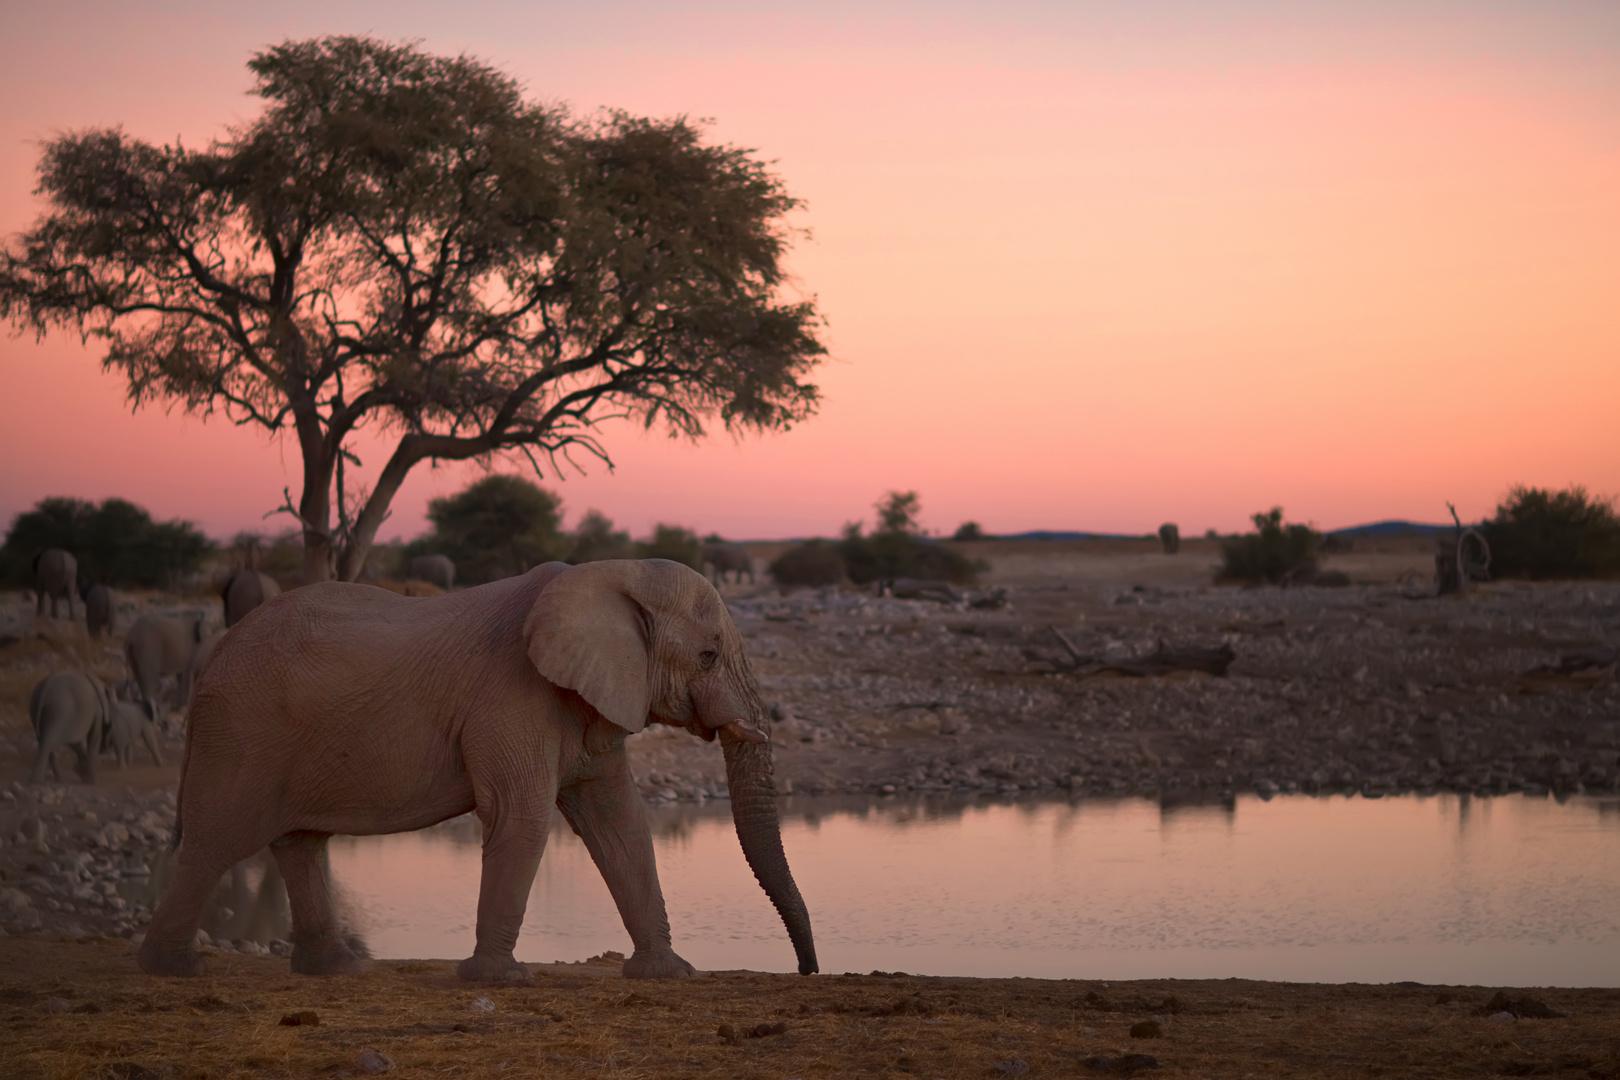 Elefant in Namibia bei Sonnenuntergang